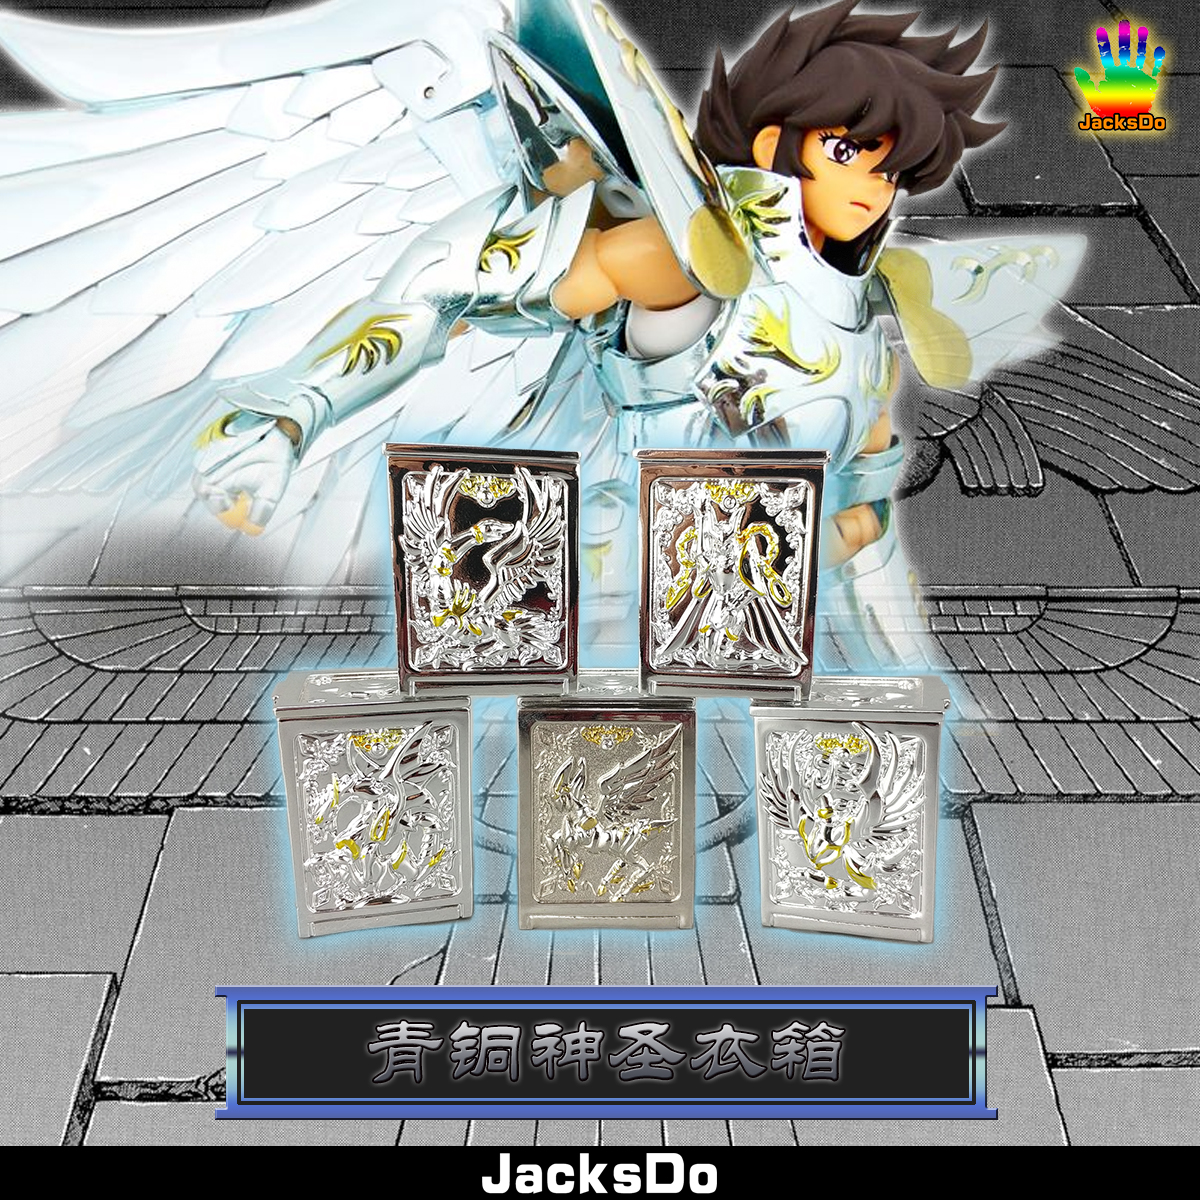 JacksDo_box_bronze_5_roki_inask_028.jpg